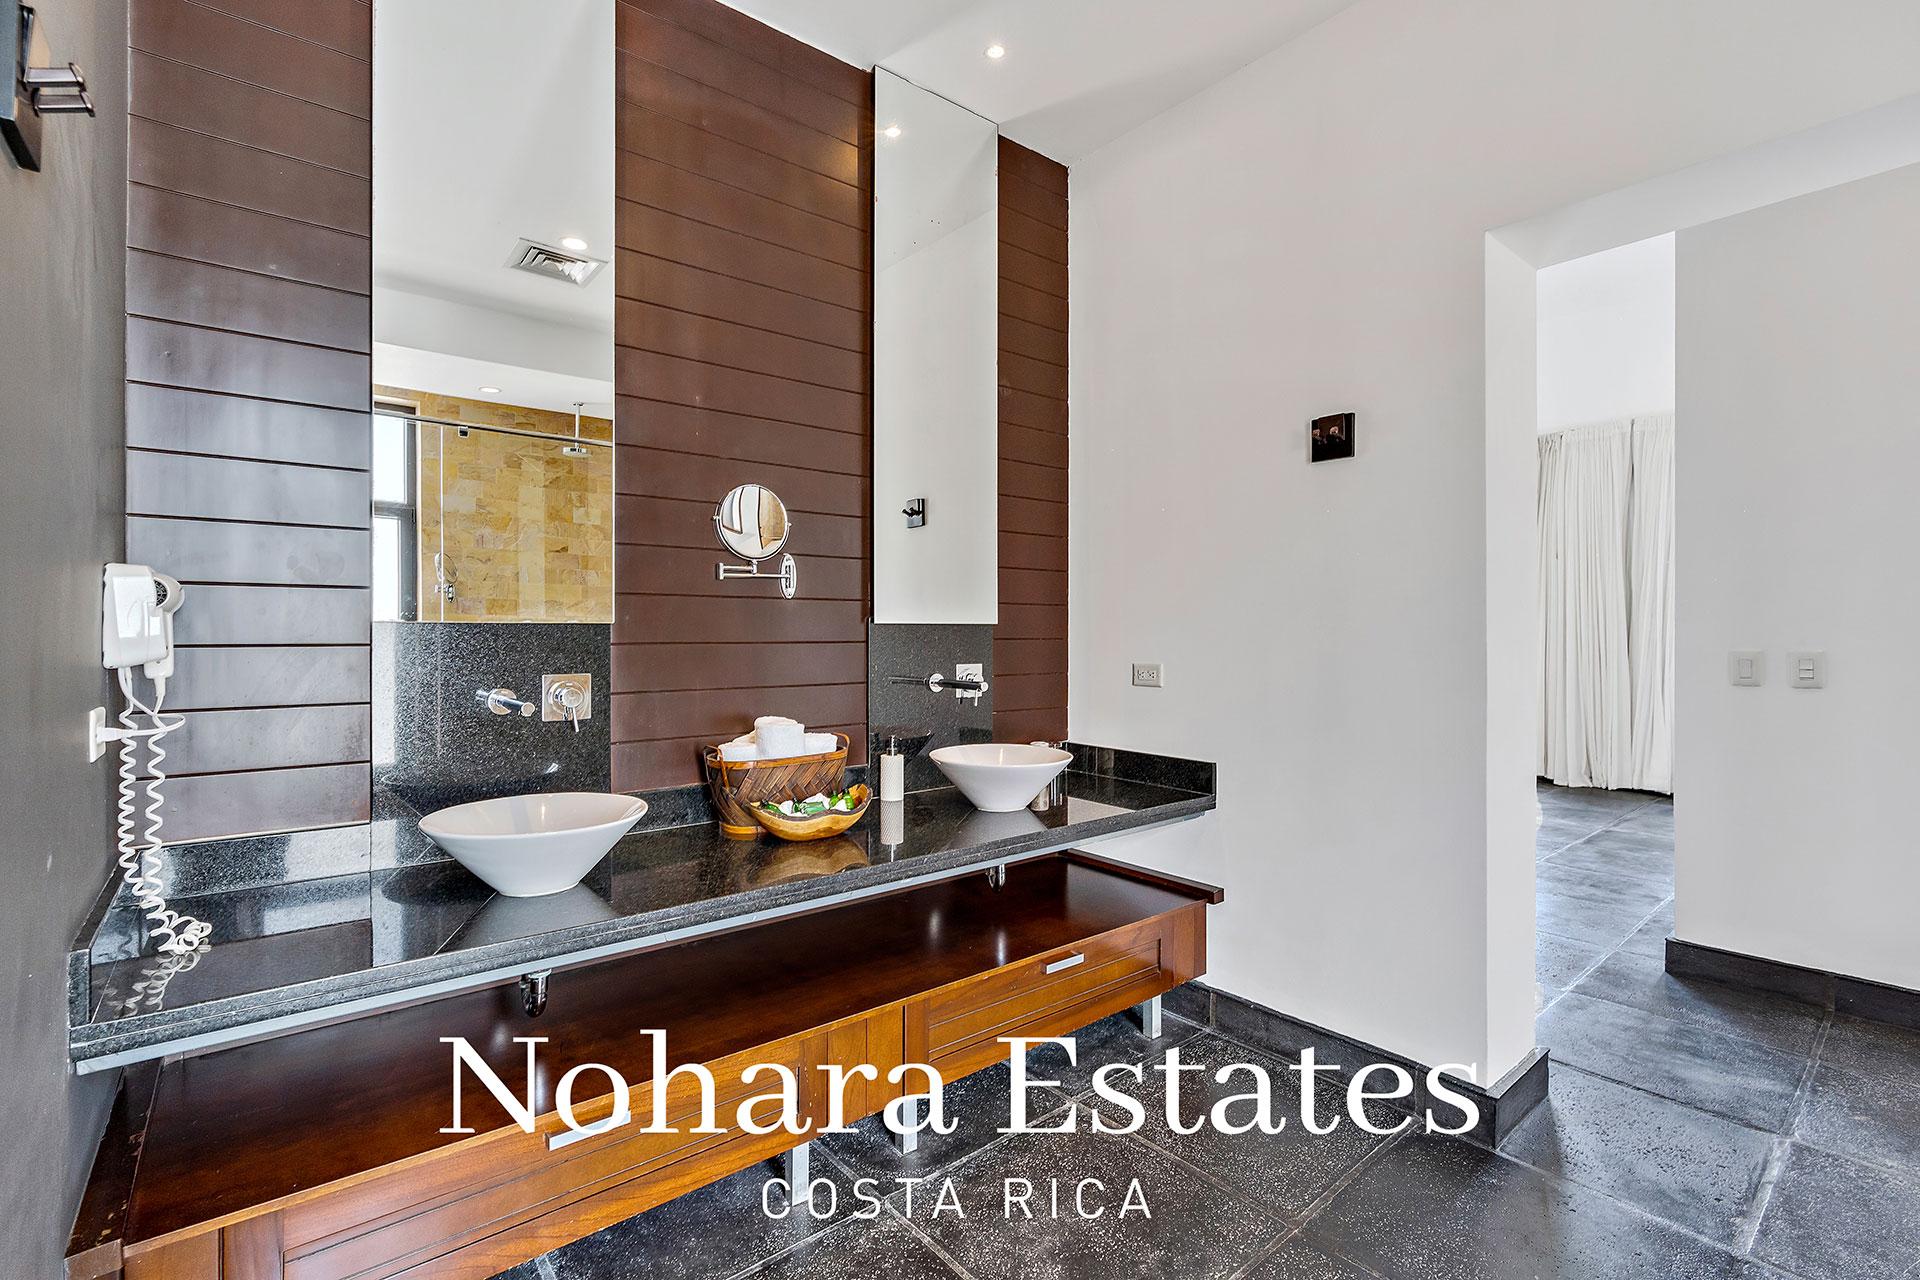 Nohara Estates Costa Rica 122 Apartment Quepos Los Altos 10